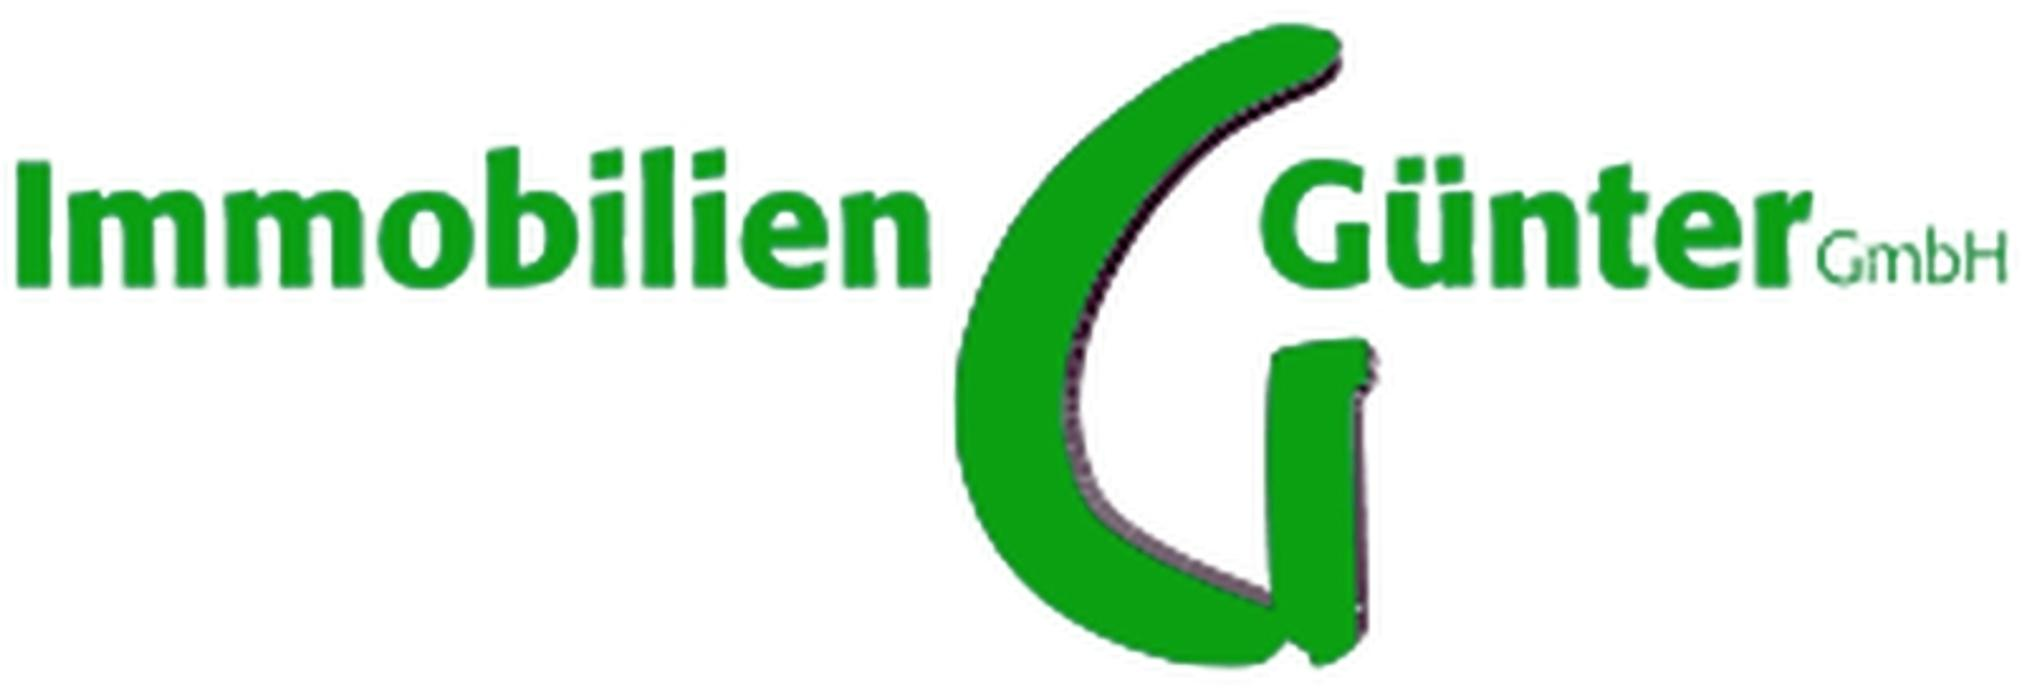 Bild zu Immobilien Günter GmbH in Ettlingen